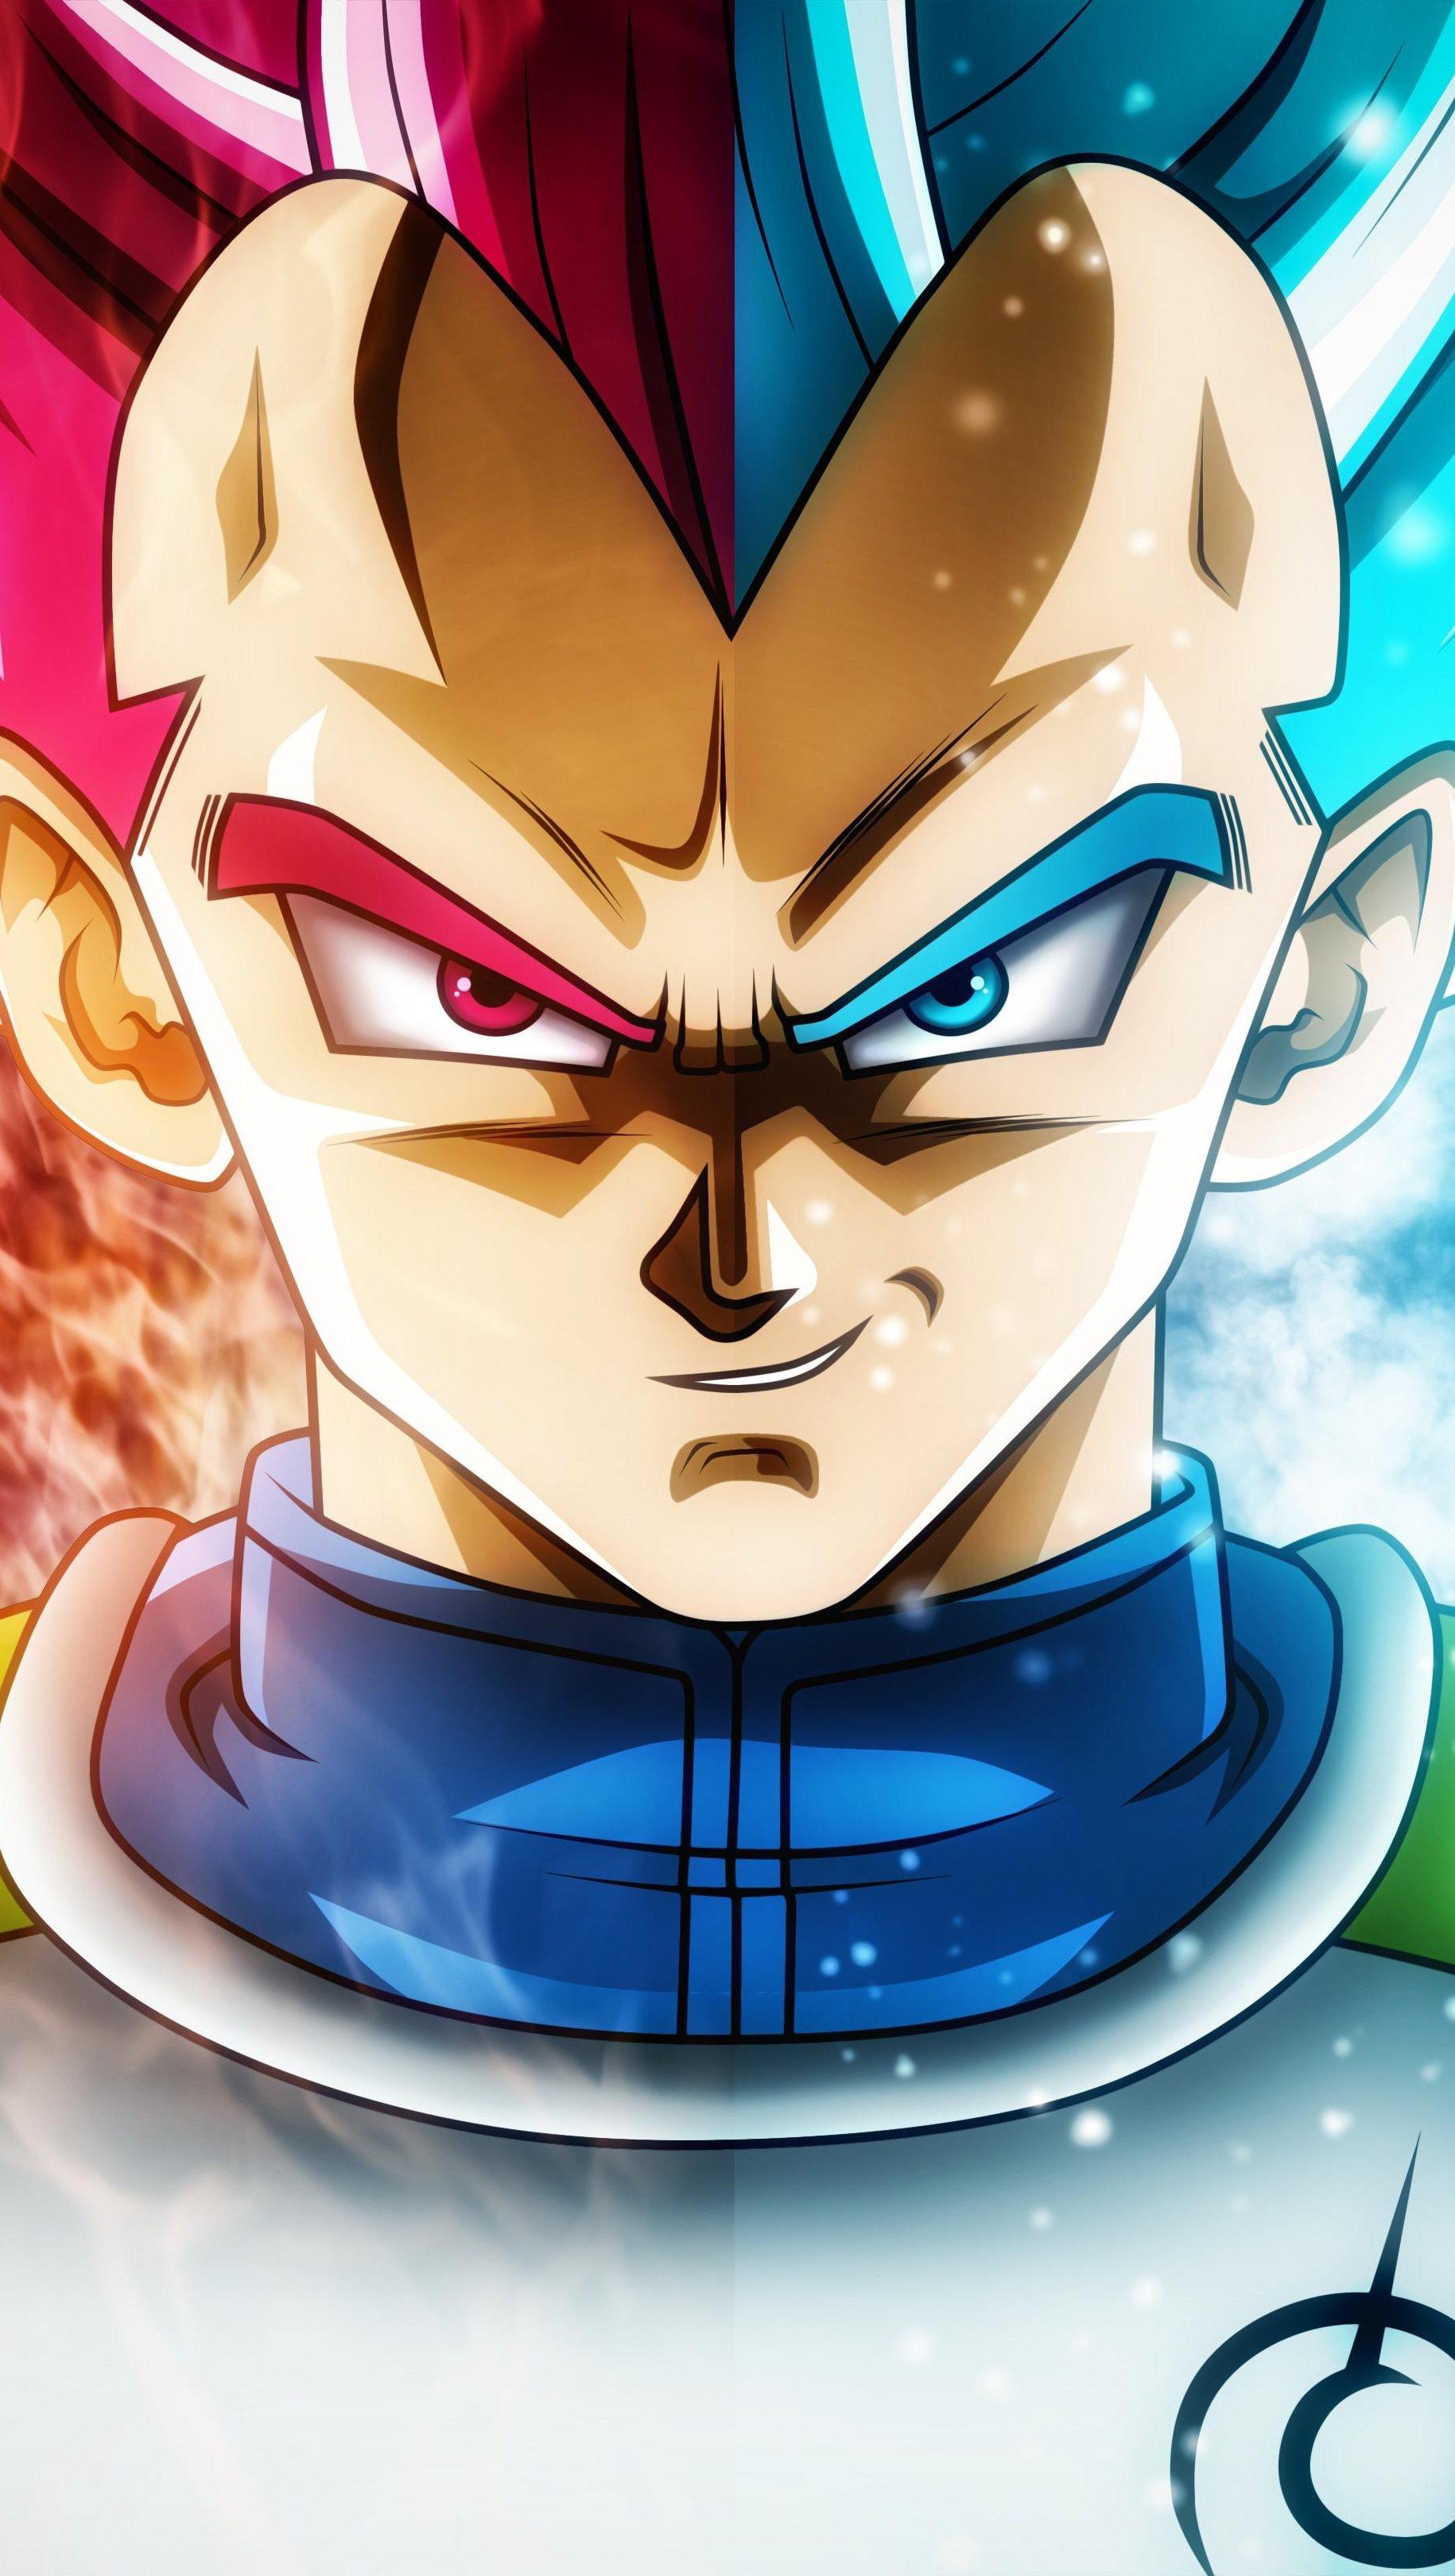 Fondos de pantalla Anime Vegeta Saiyan Blue y Saiyan God Dragon Ball Super Vertical